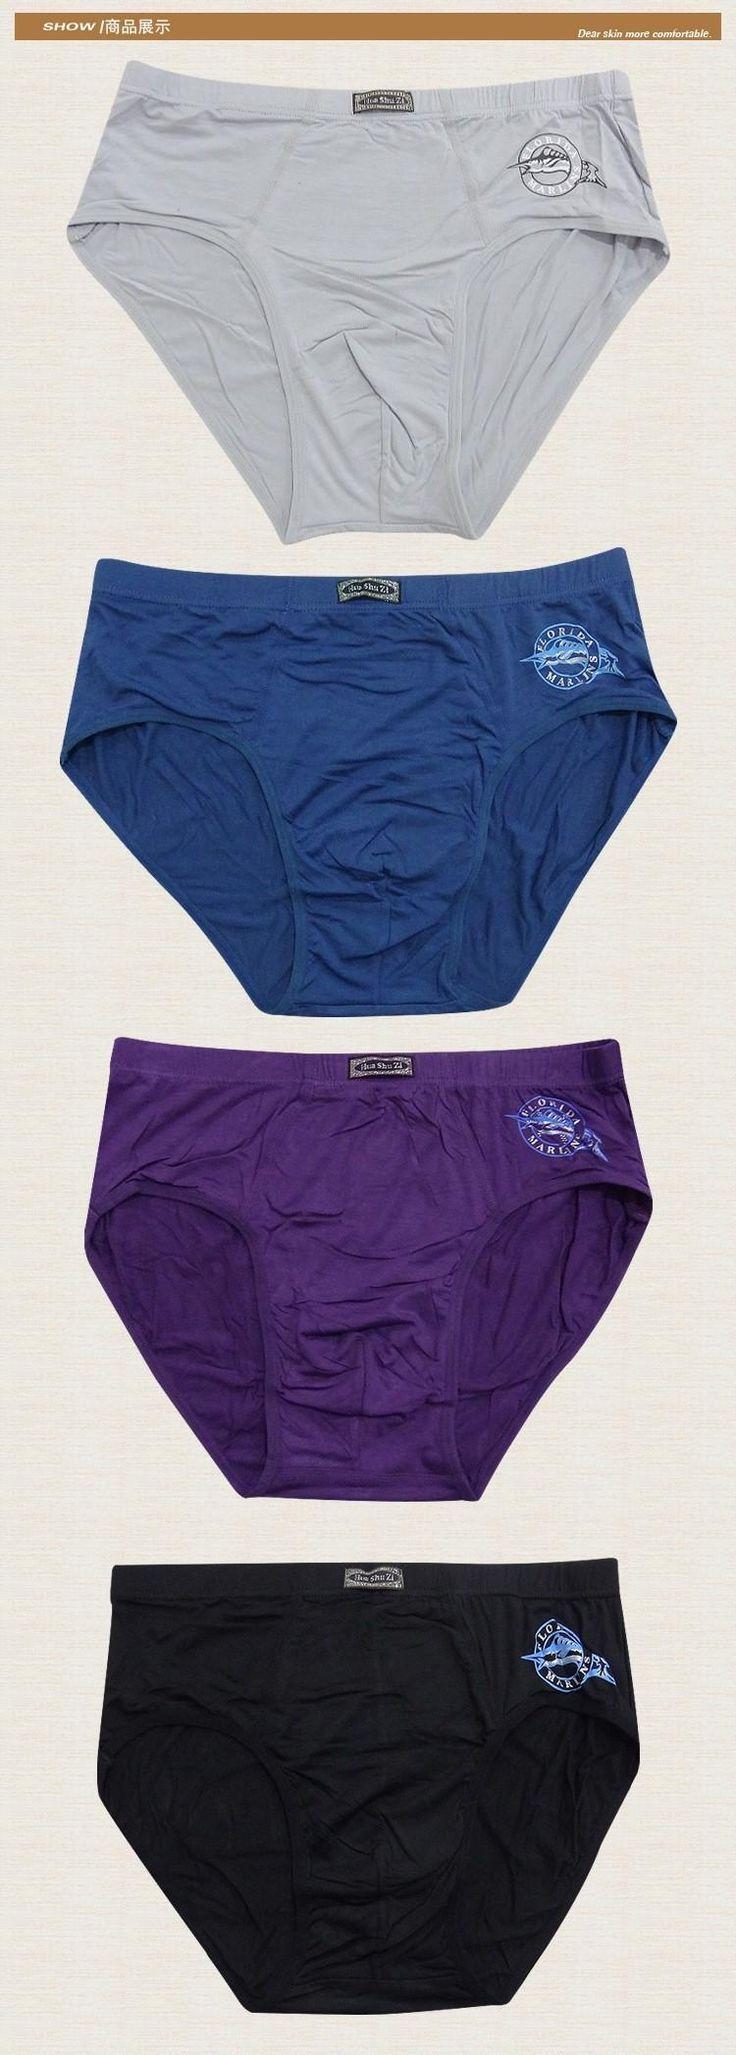 4pcs/lot  Supper Big Men Briefs Soft Bamboo Fiber Underwear Brief Cuecas calzoncillos hombre slips Plus Size 4XL 5XL